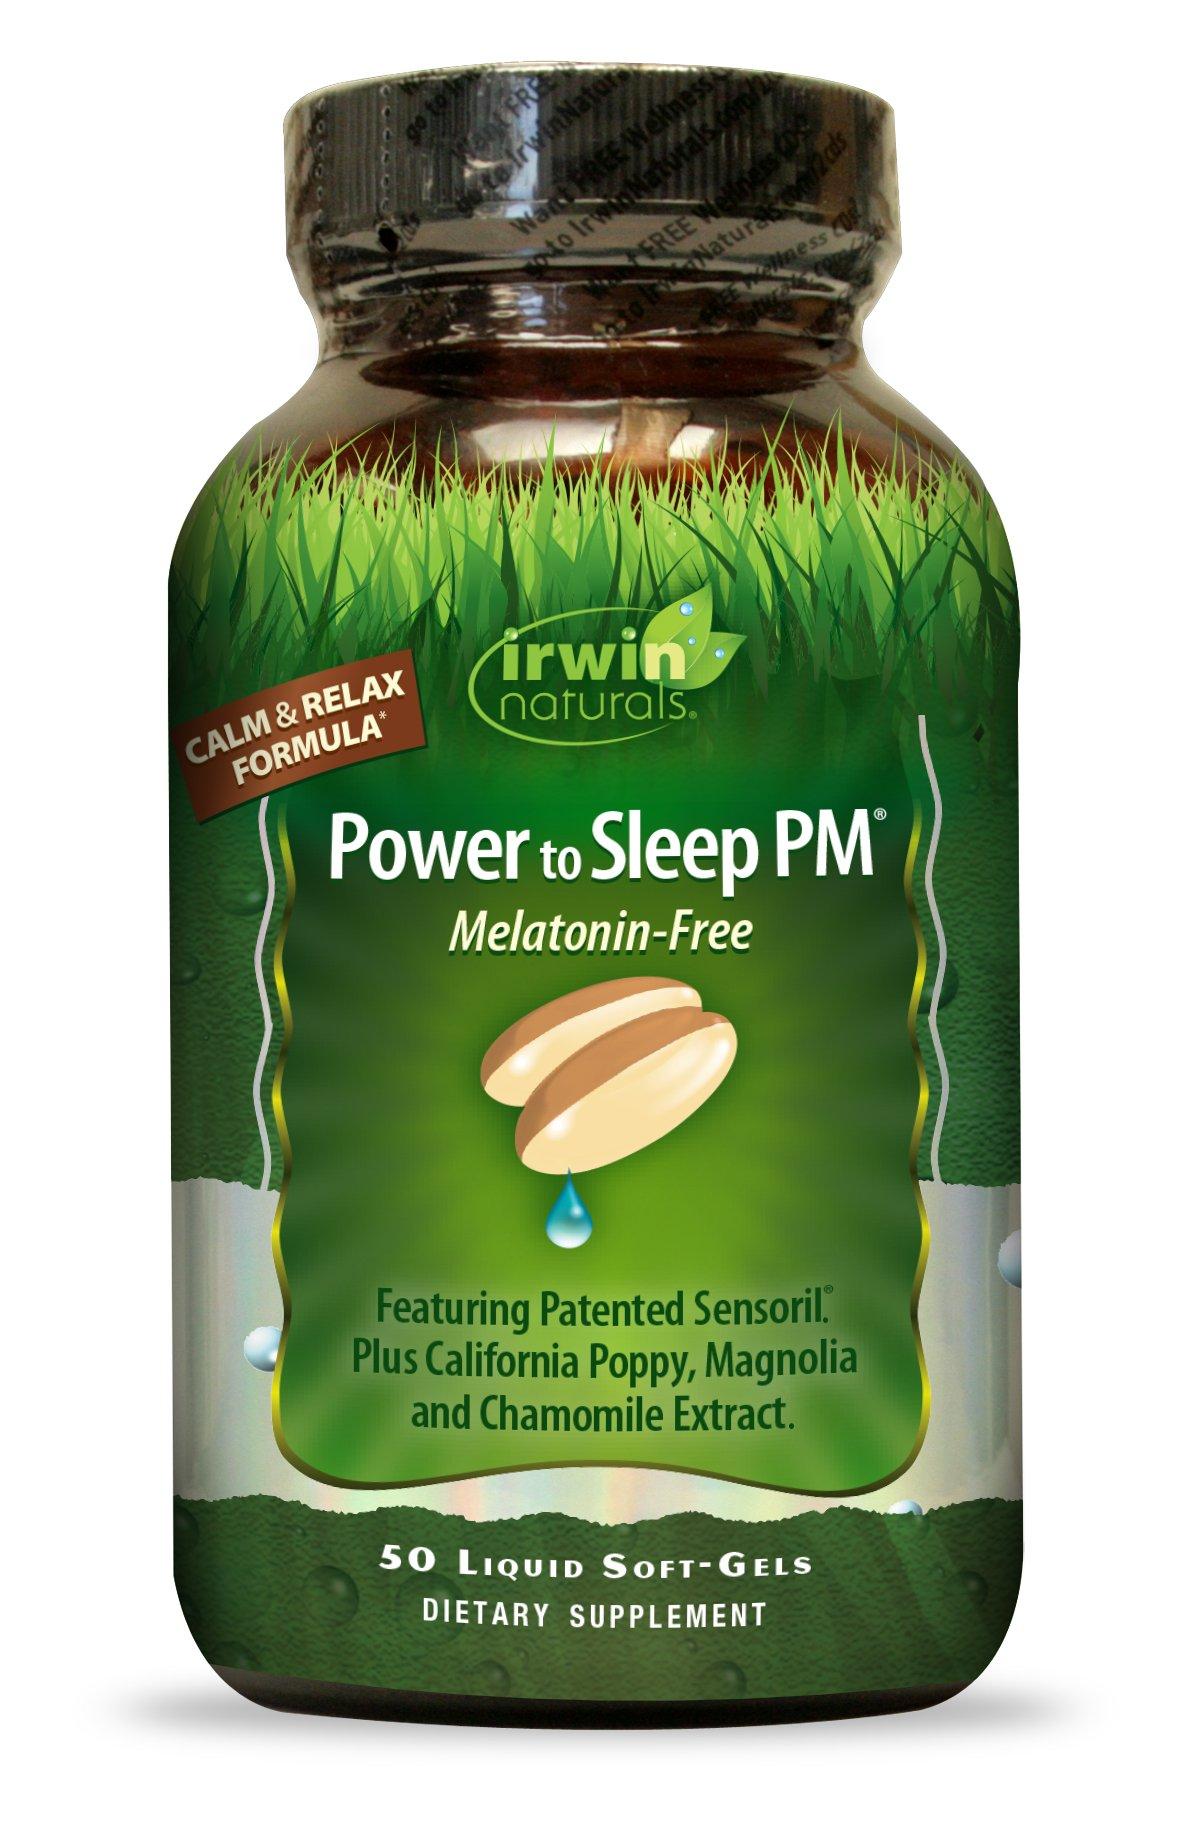 Irwin Naturals Power To Sleep PM Melatonin-Free Supplement, 50 Count